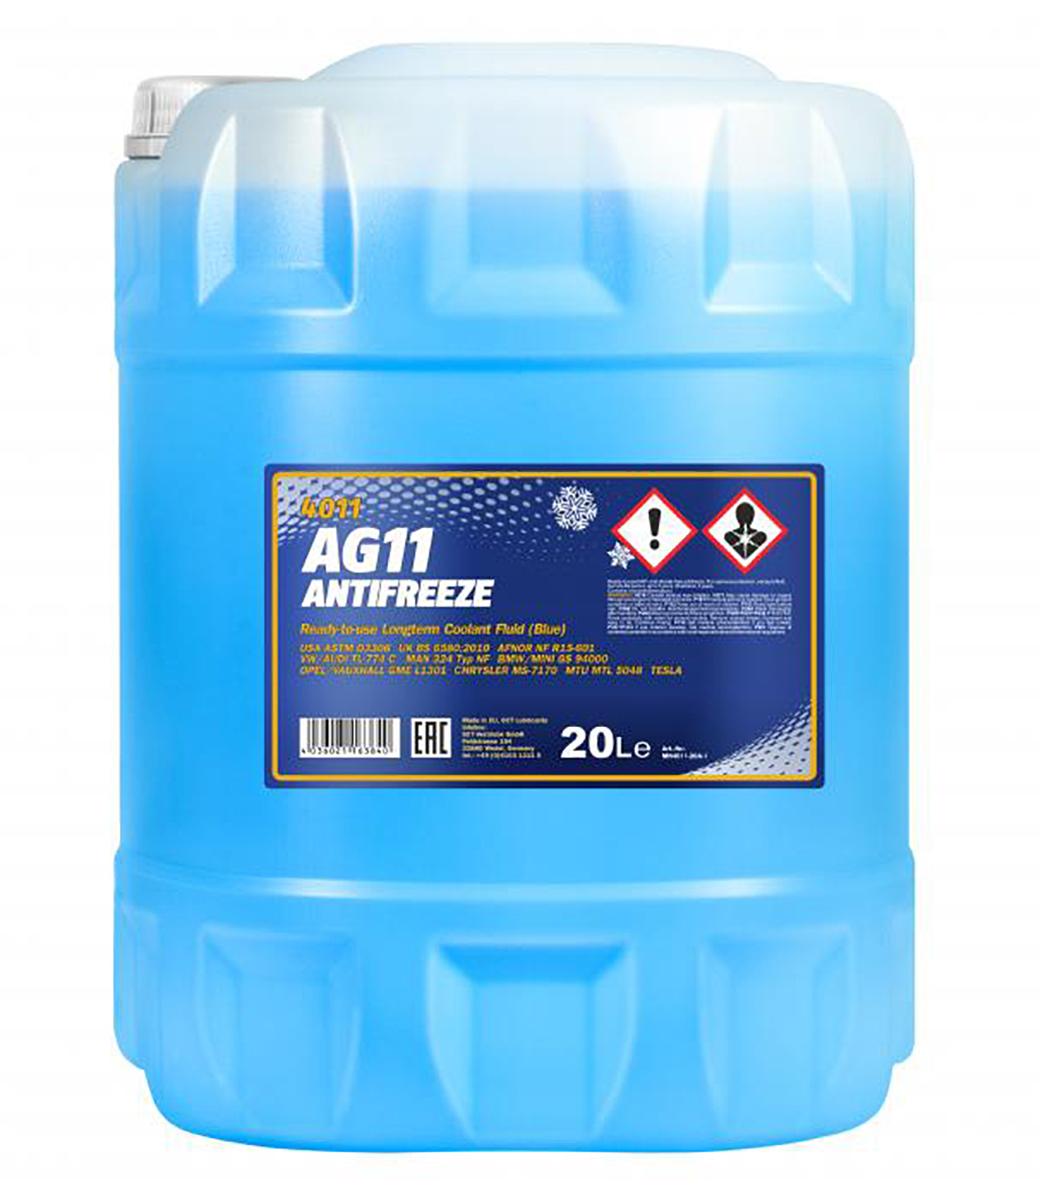 Antifreeze AG11 (-40) Longterm